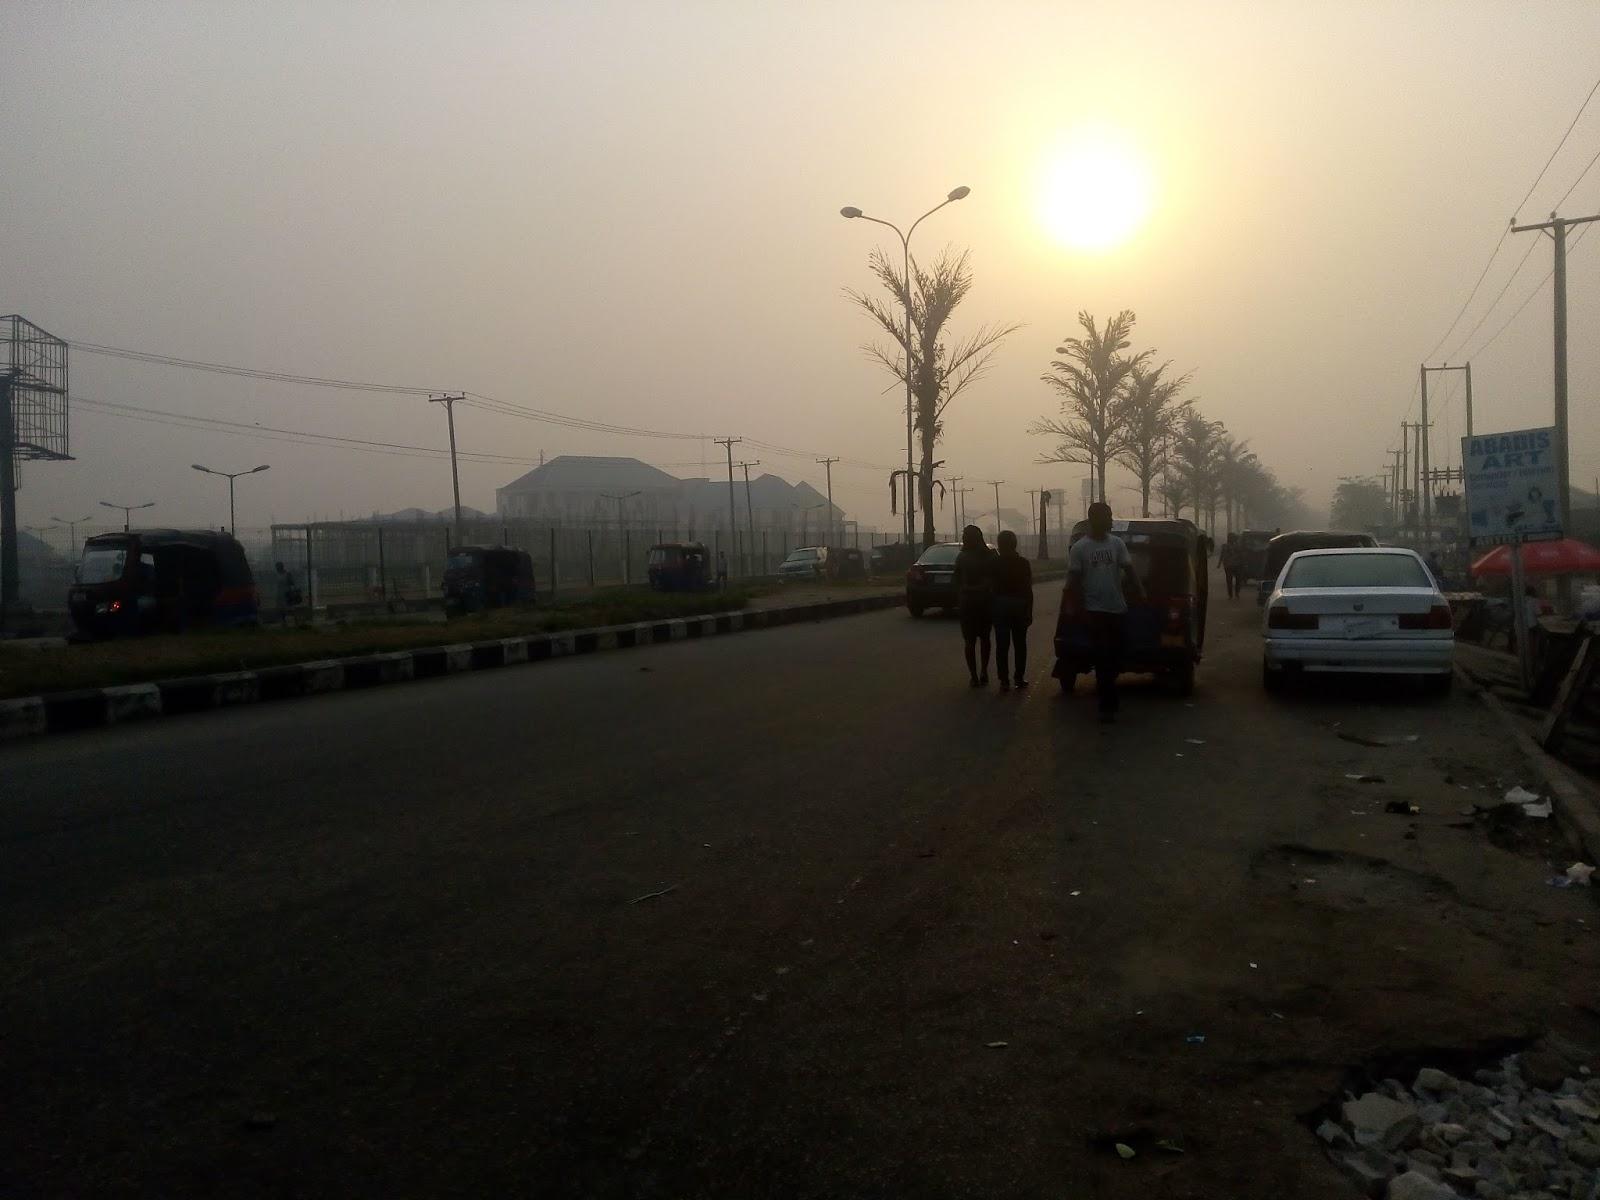 Early morning sunrise in Yenagoa